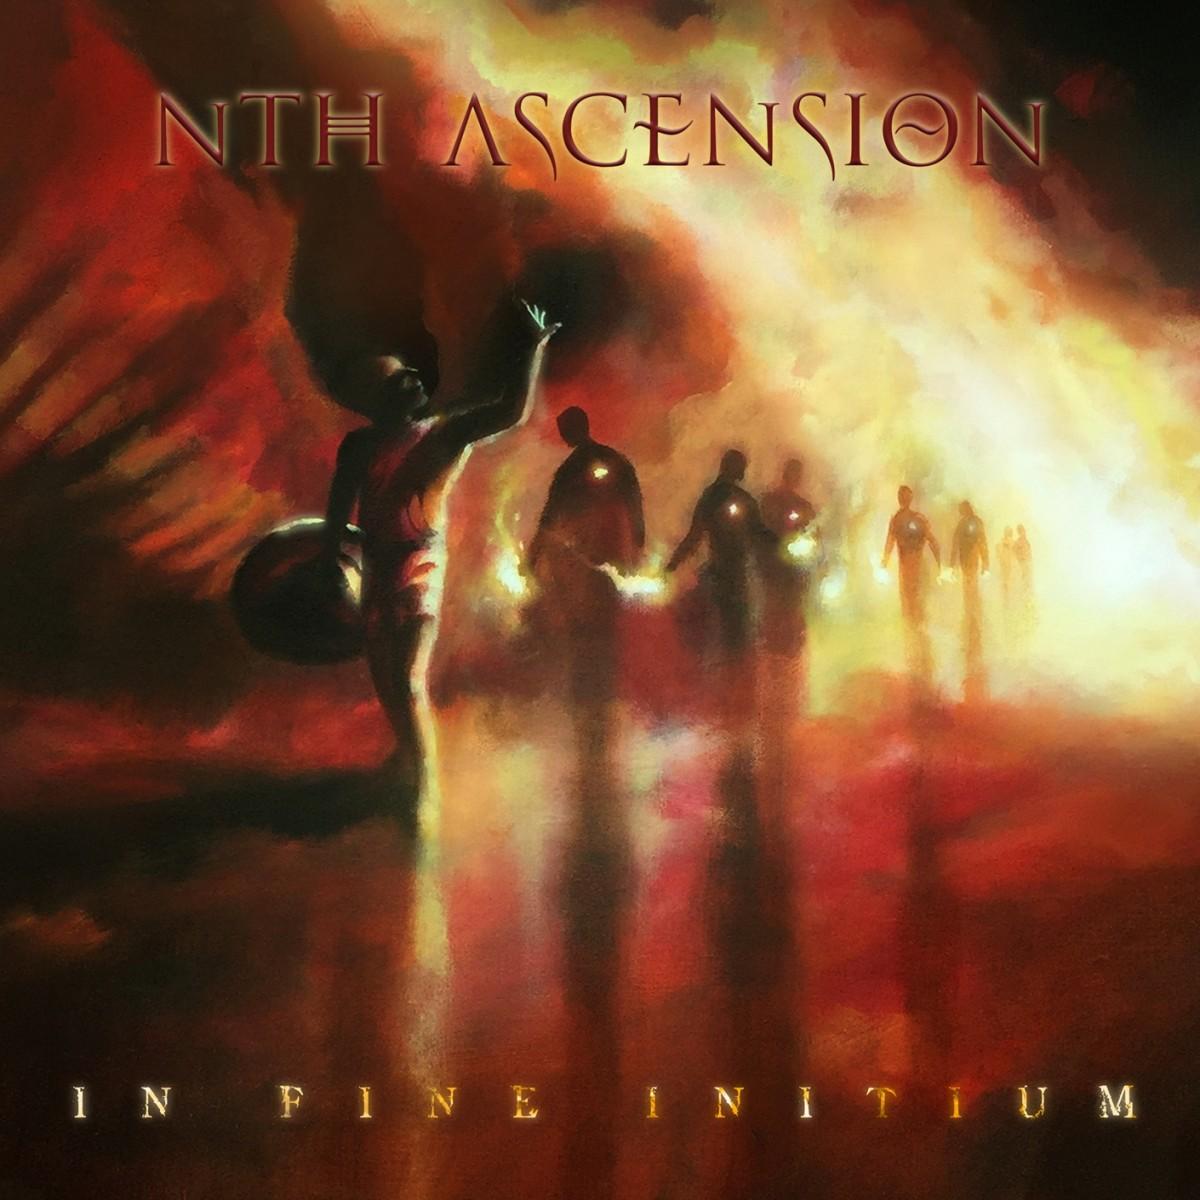 nth-ascension-in-fine-initium